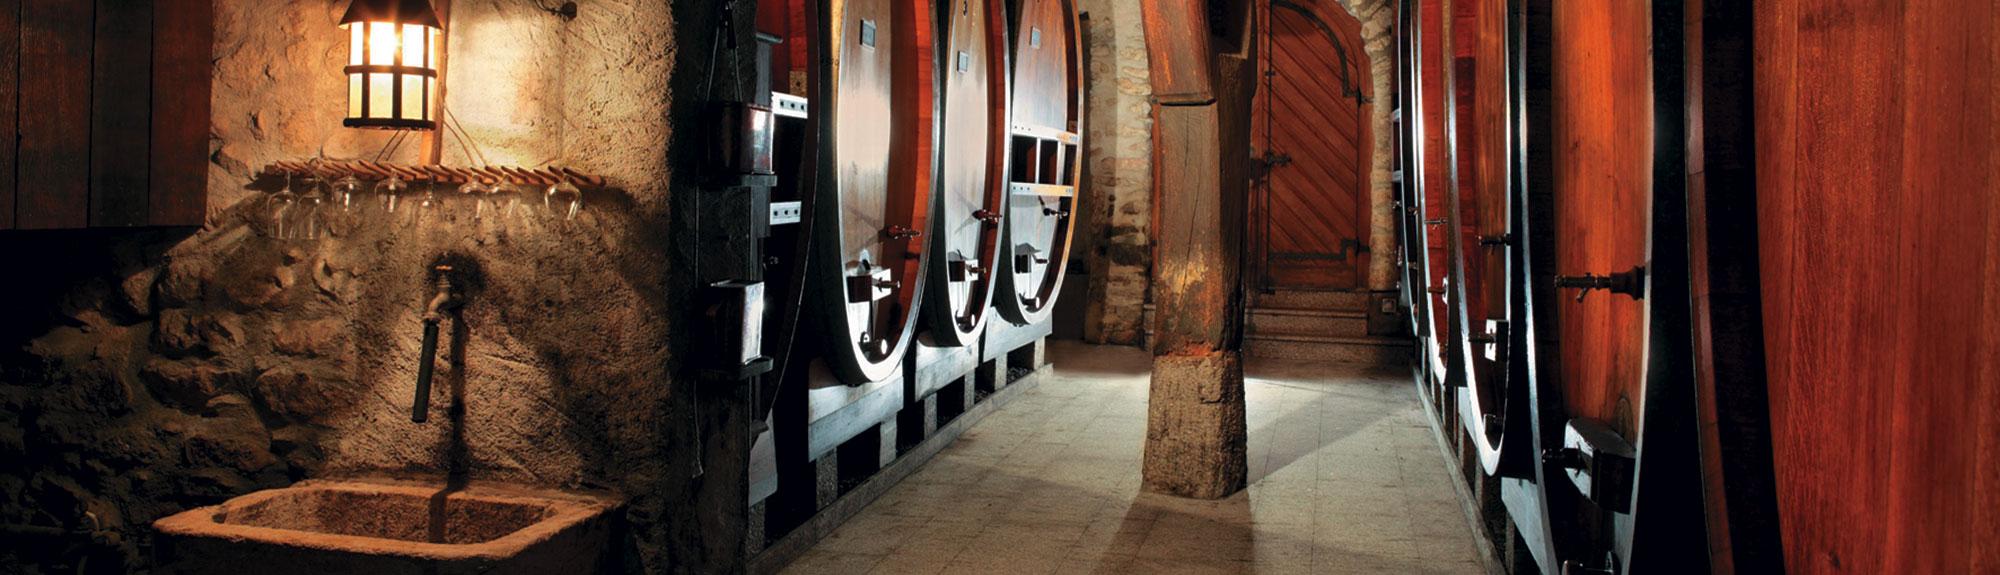 cellar-old